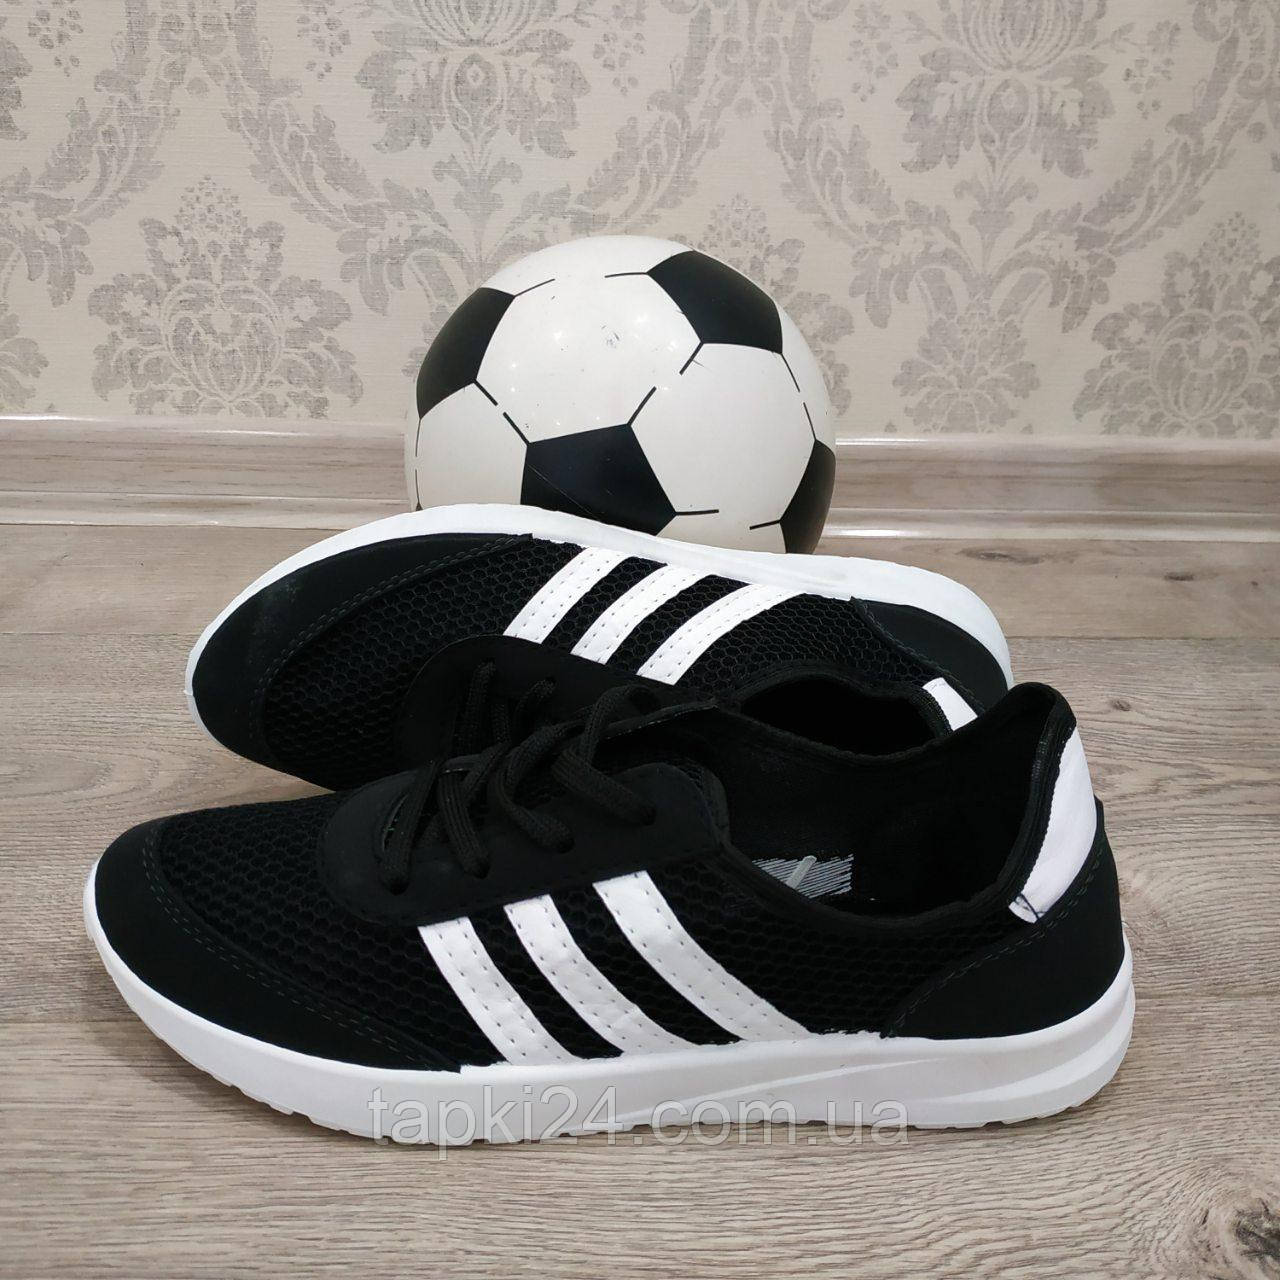 b842a5e8 Кроссовки мужские на шнурках код 140 адидас: заказ, цены в ...